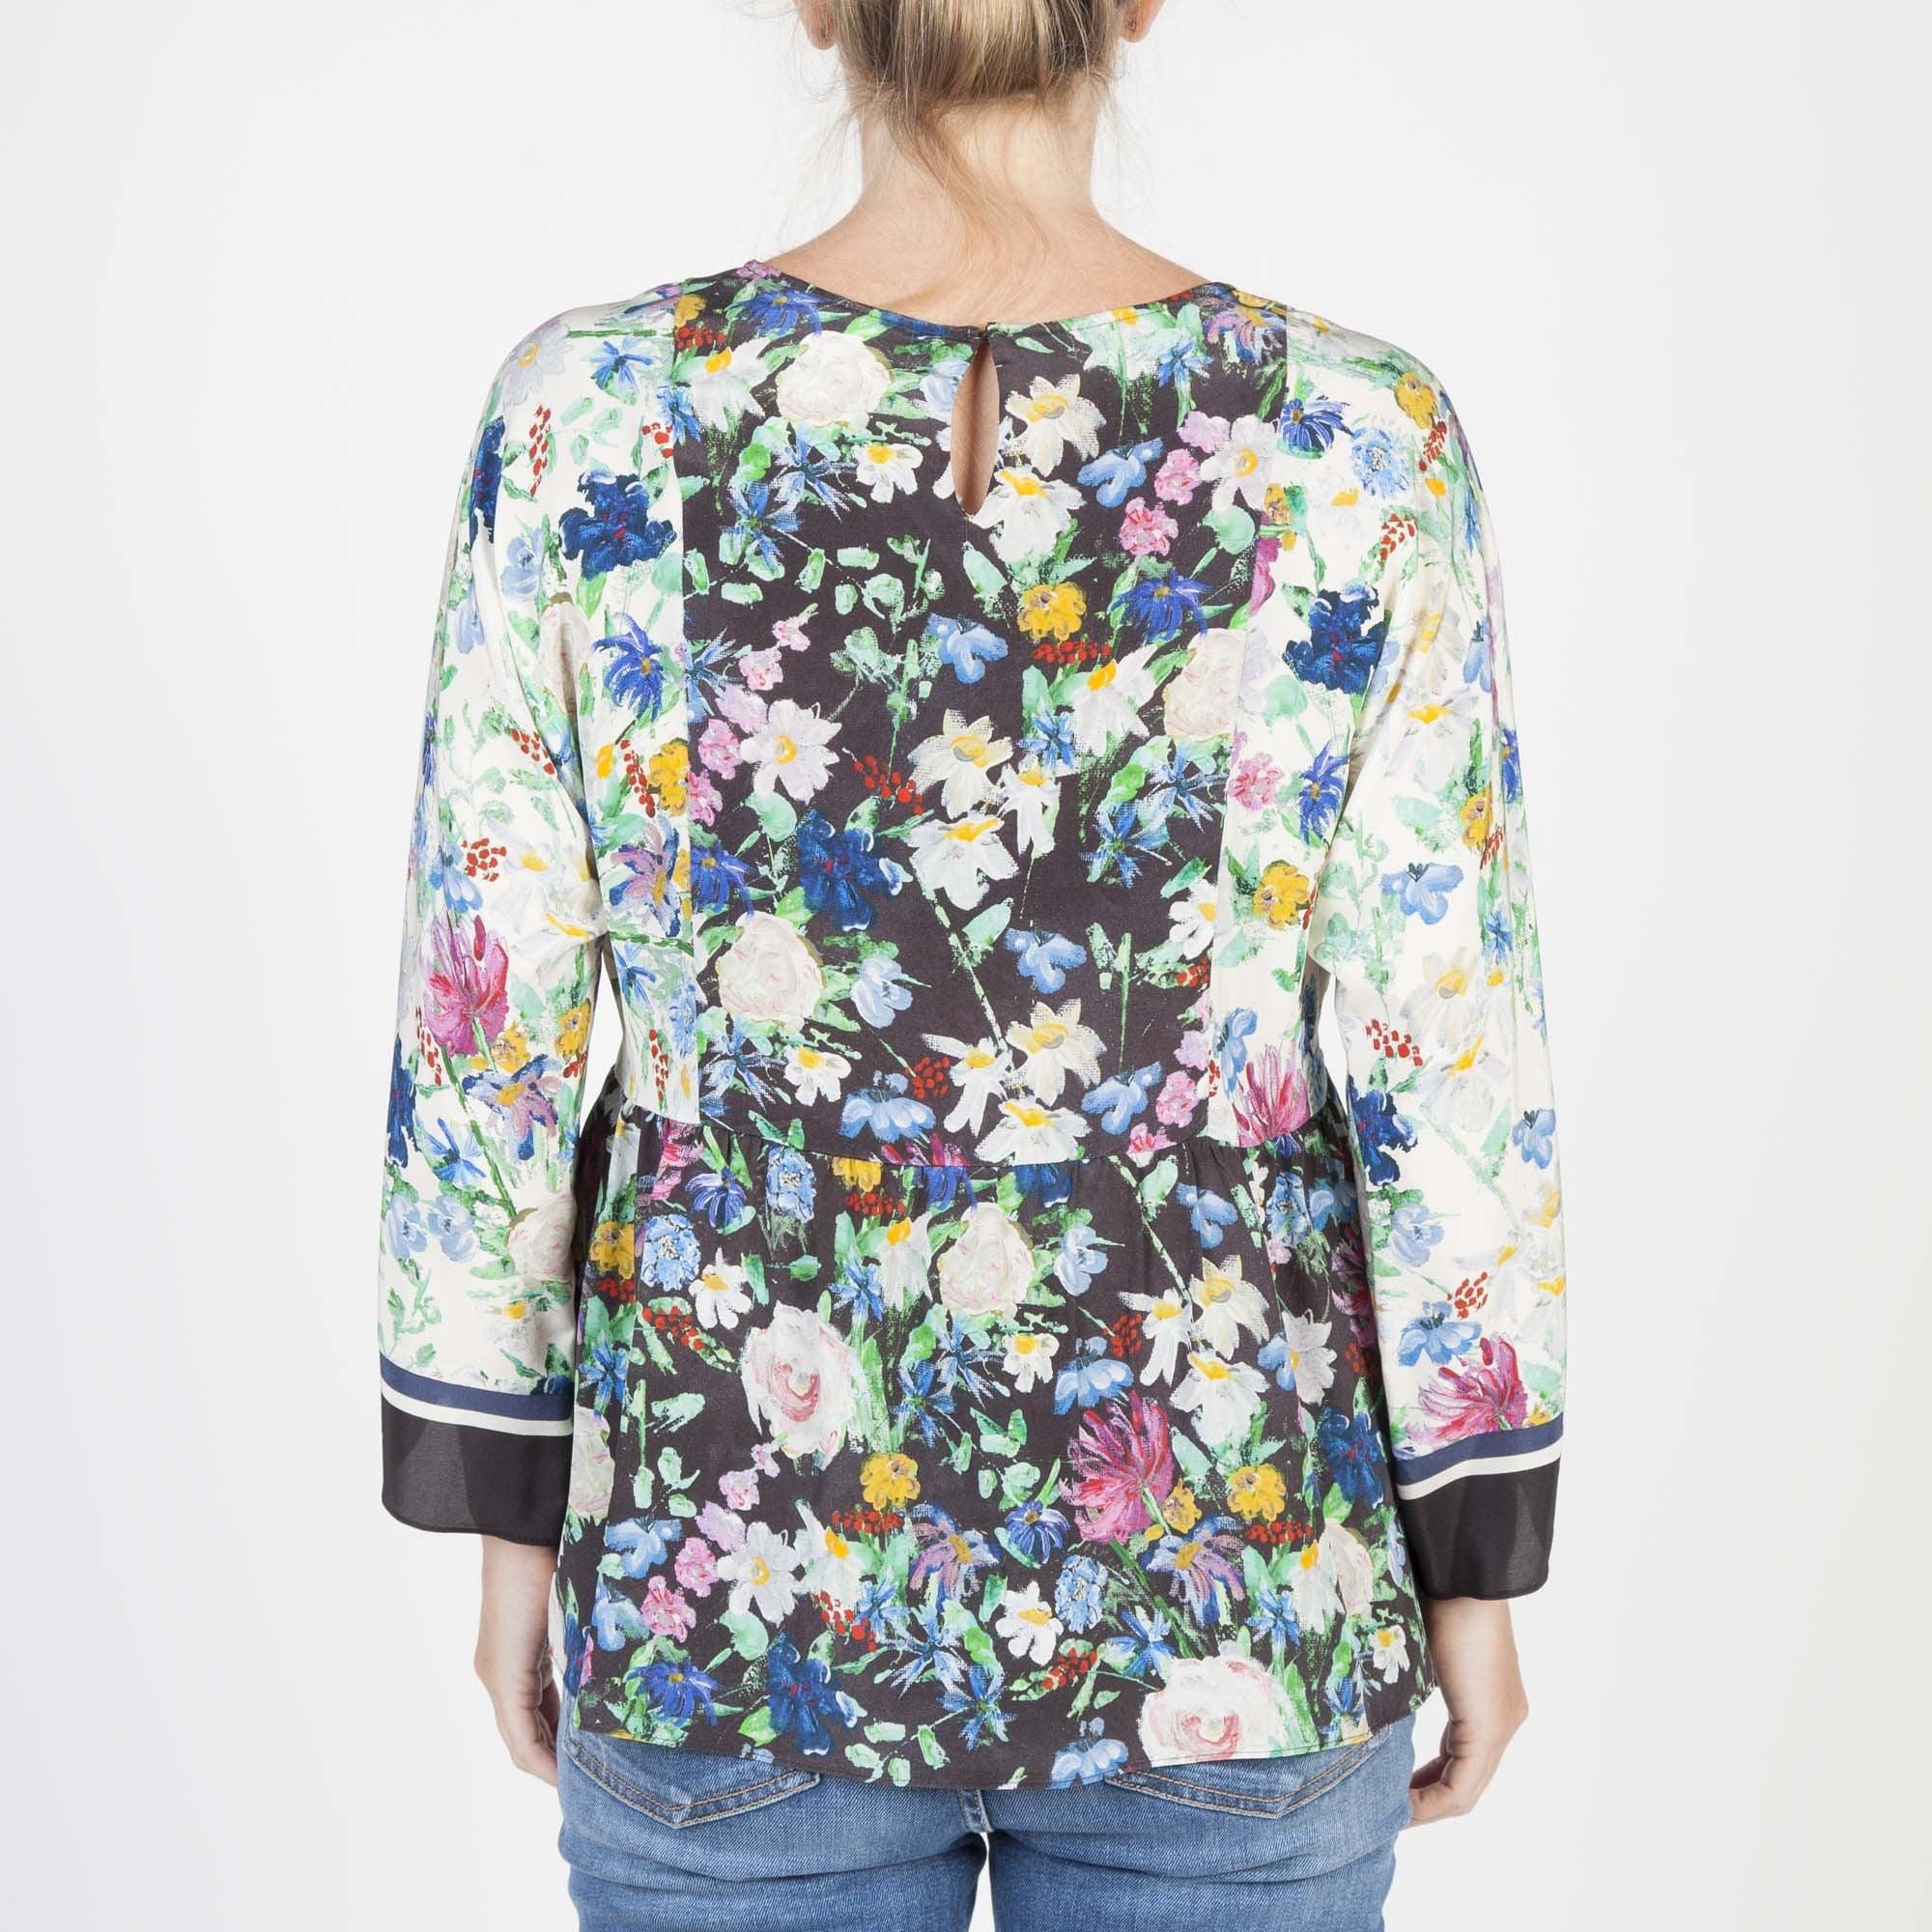 a789fa53fd9 Verbas Silk Floral Print Top in Black Multi